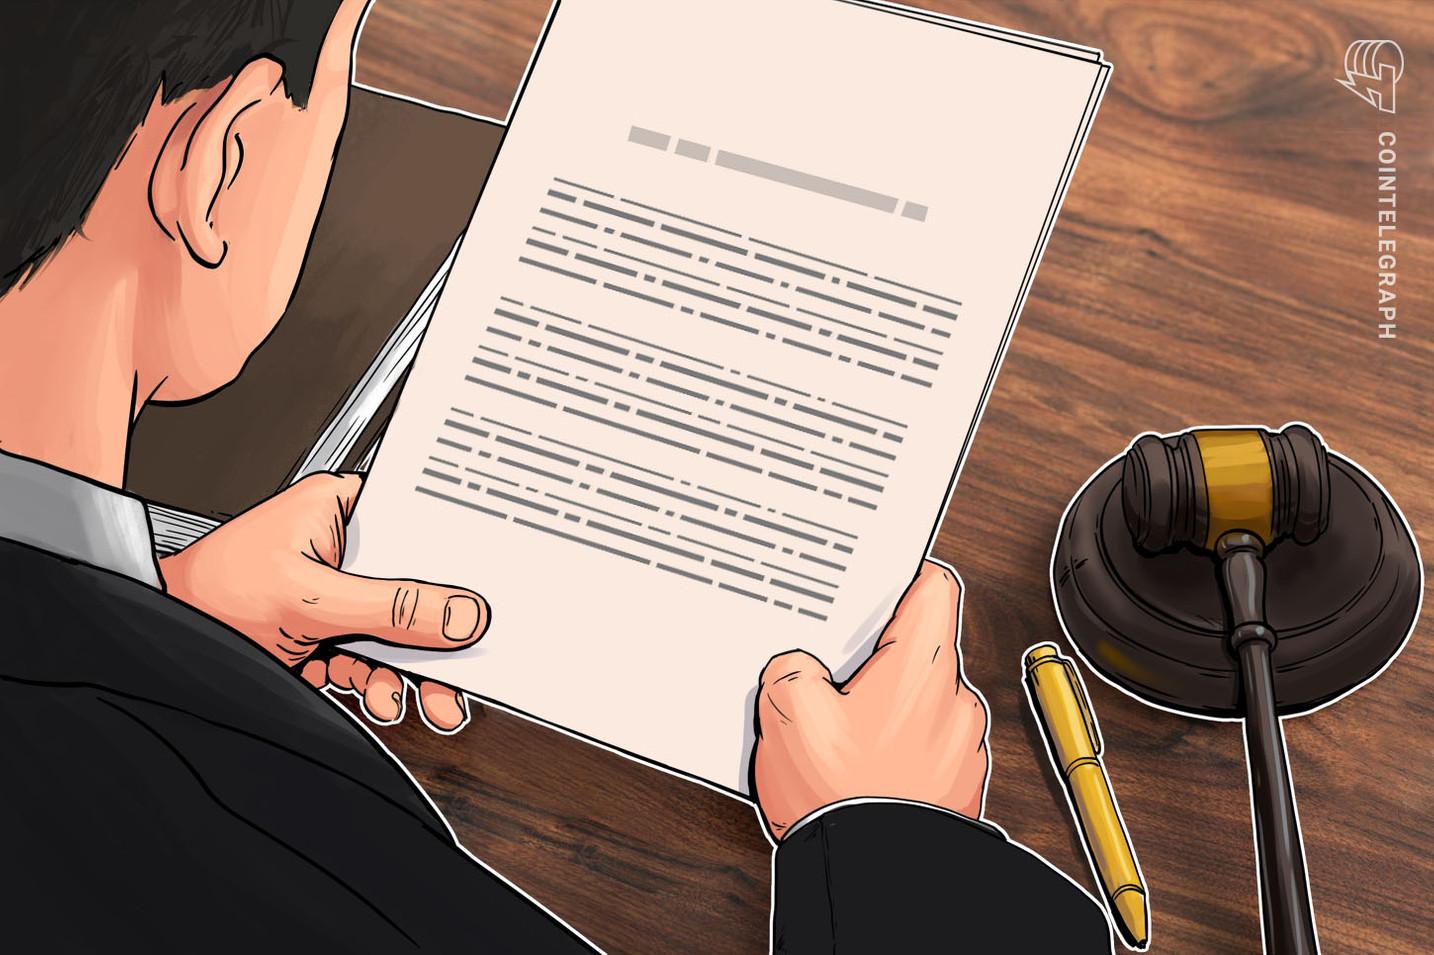 Judge Certifies Investor Class in $70m Pot ICO Lawsuit